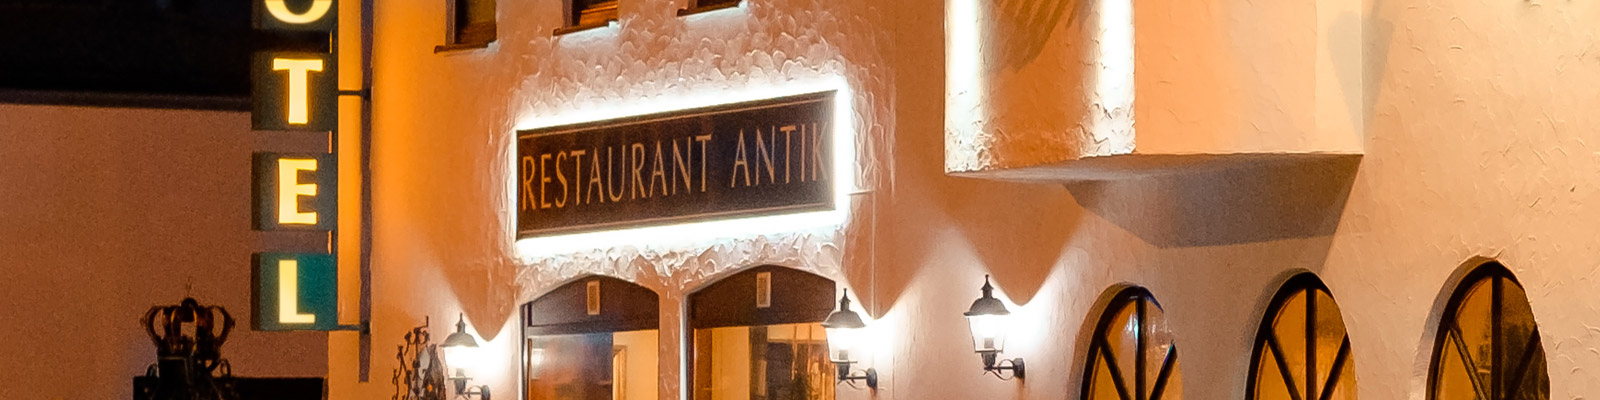 Restaurant City Hotel Antik Aalen